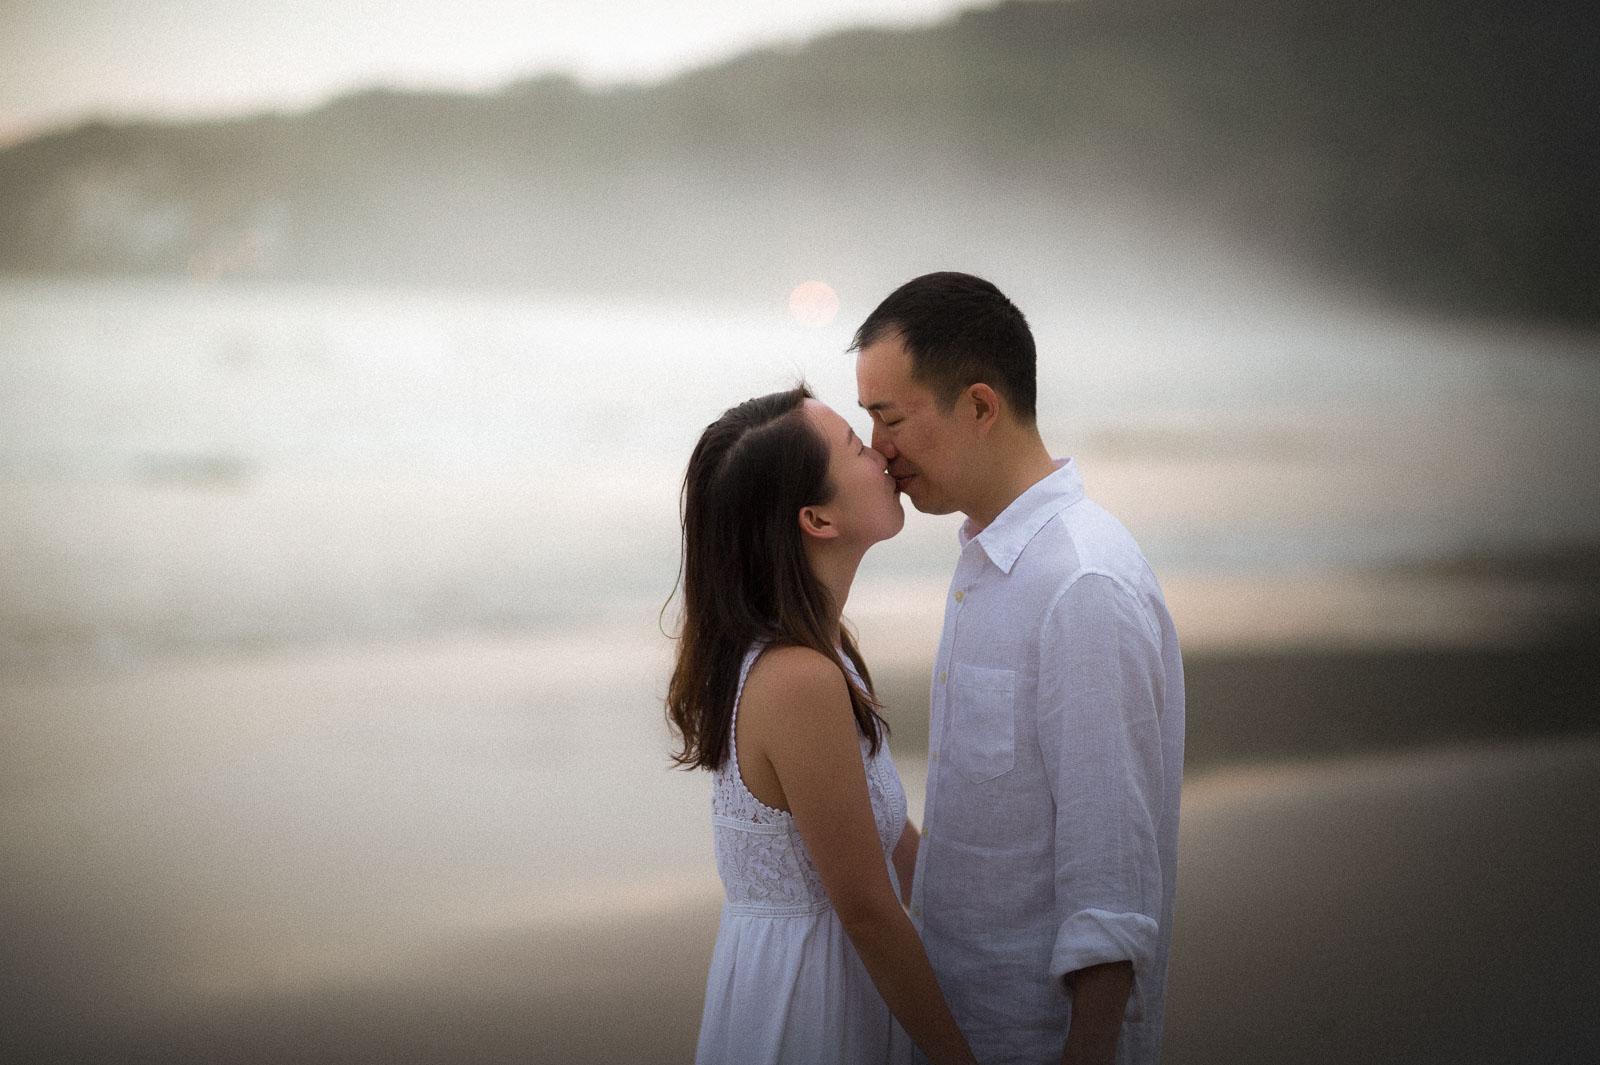 phuket-prewedding-photographer-thailand-wedding-photography-015